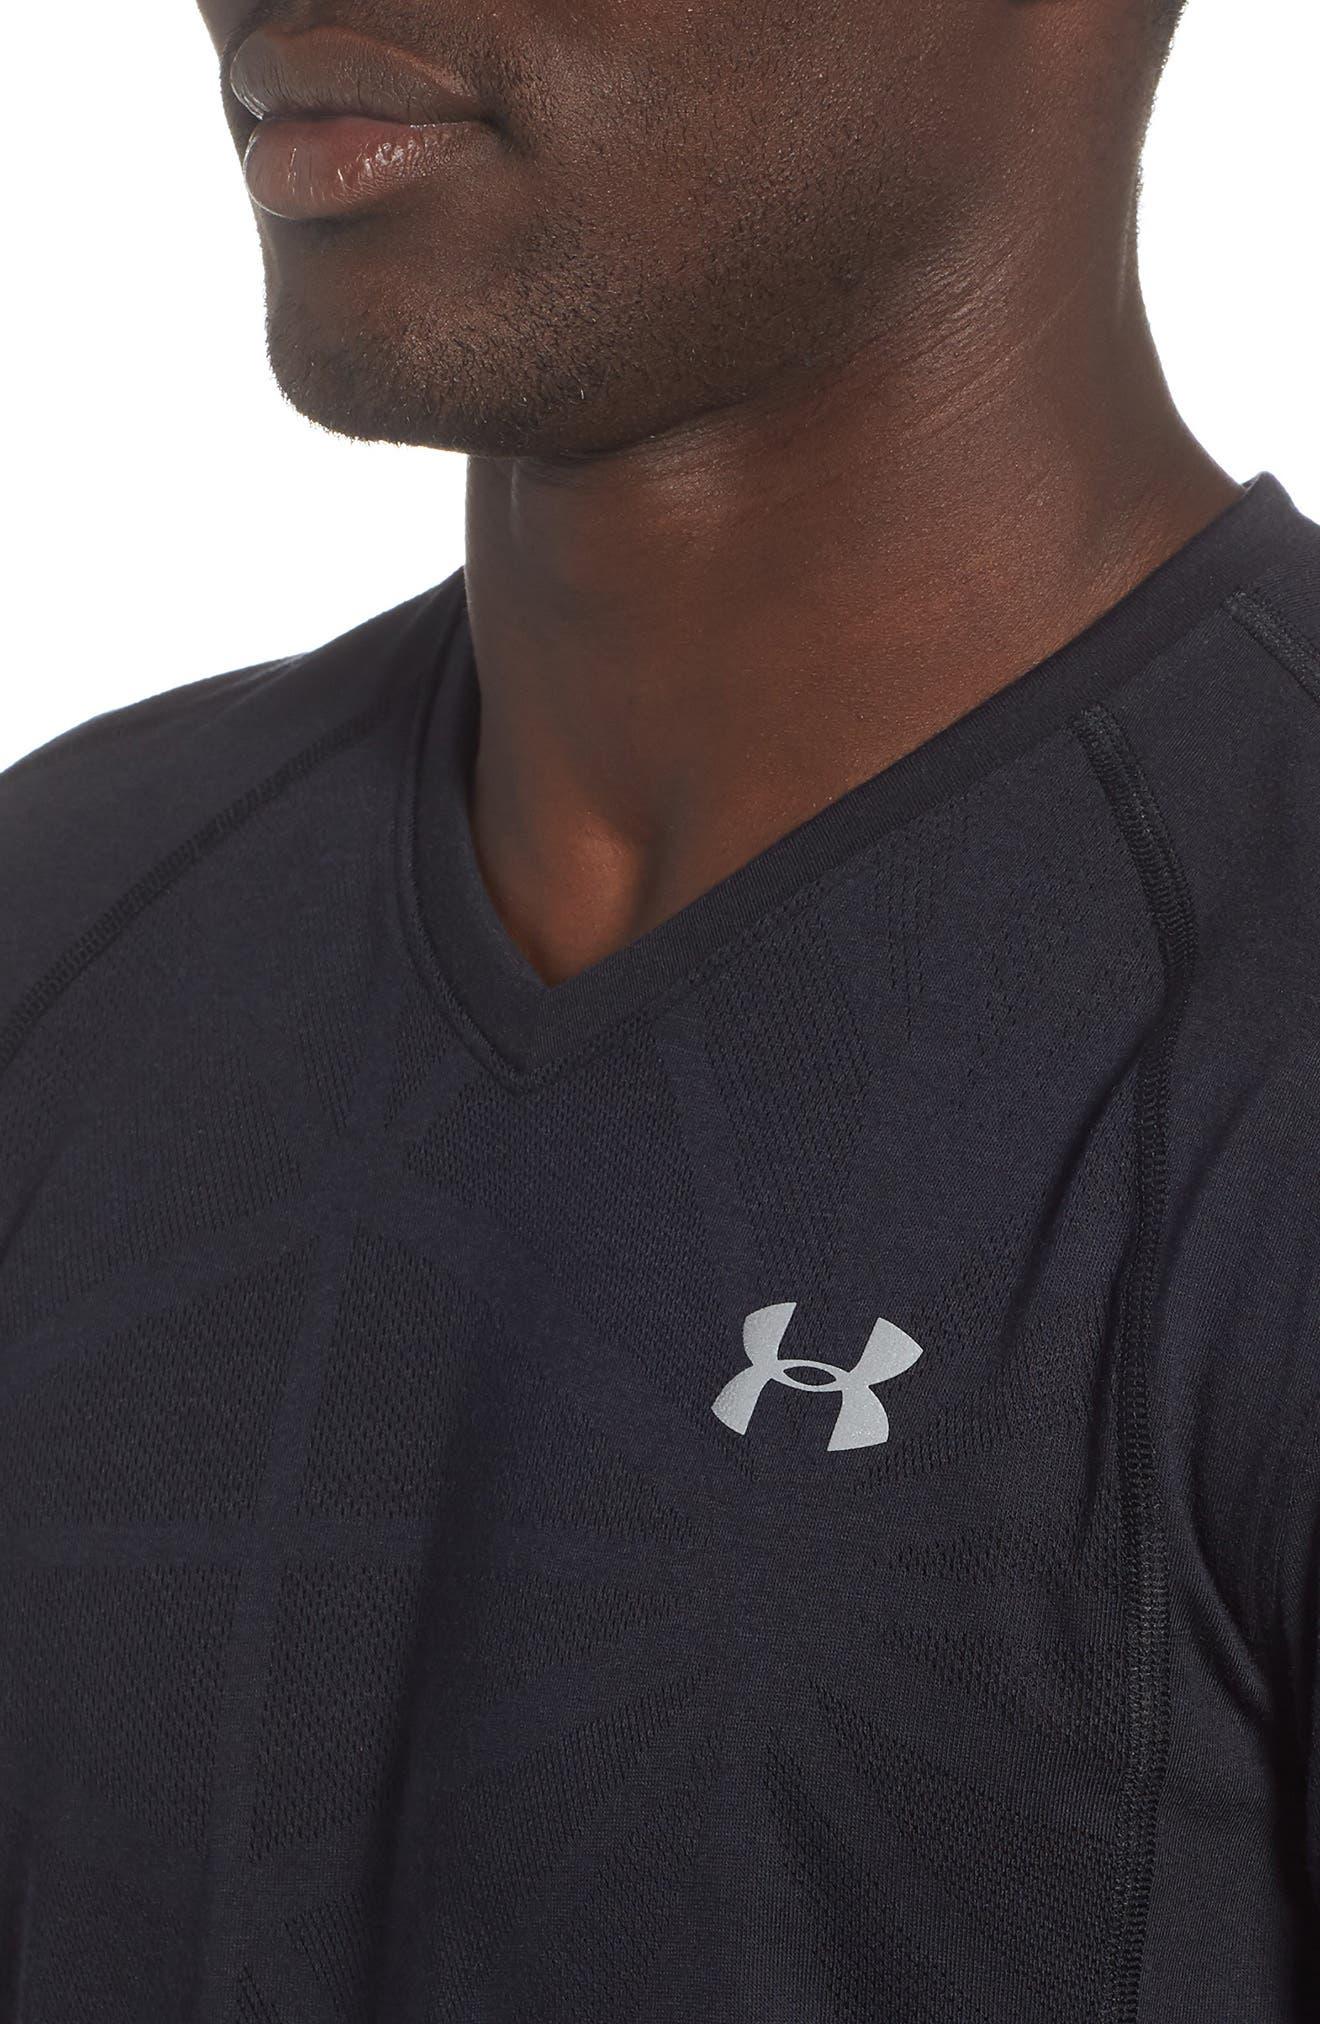 Microthread Swyft V-Neck T-Shirt,                             Alternate thumbnail 4, color,                             BLACK/ BLACK/ REFLECTIVE